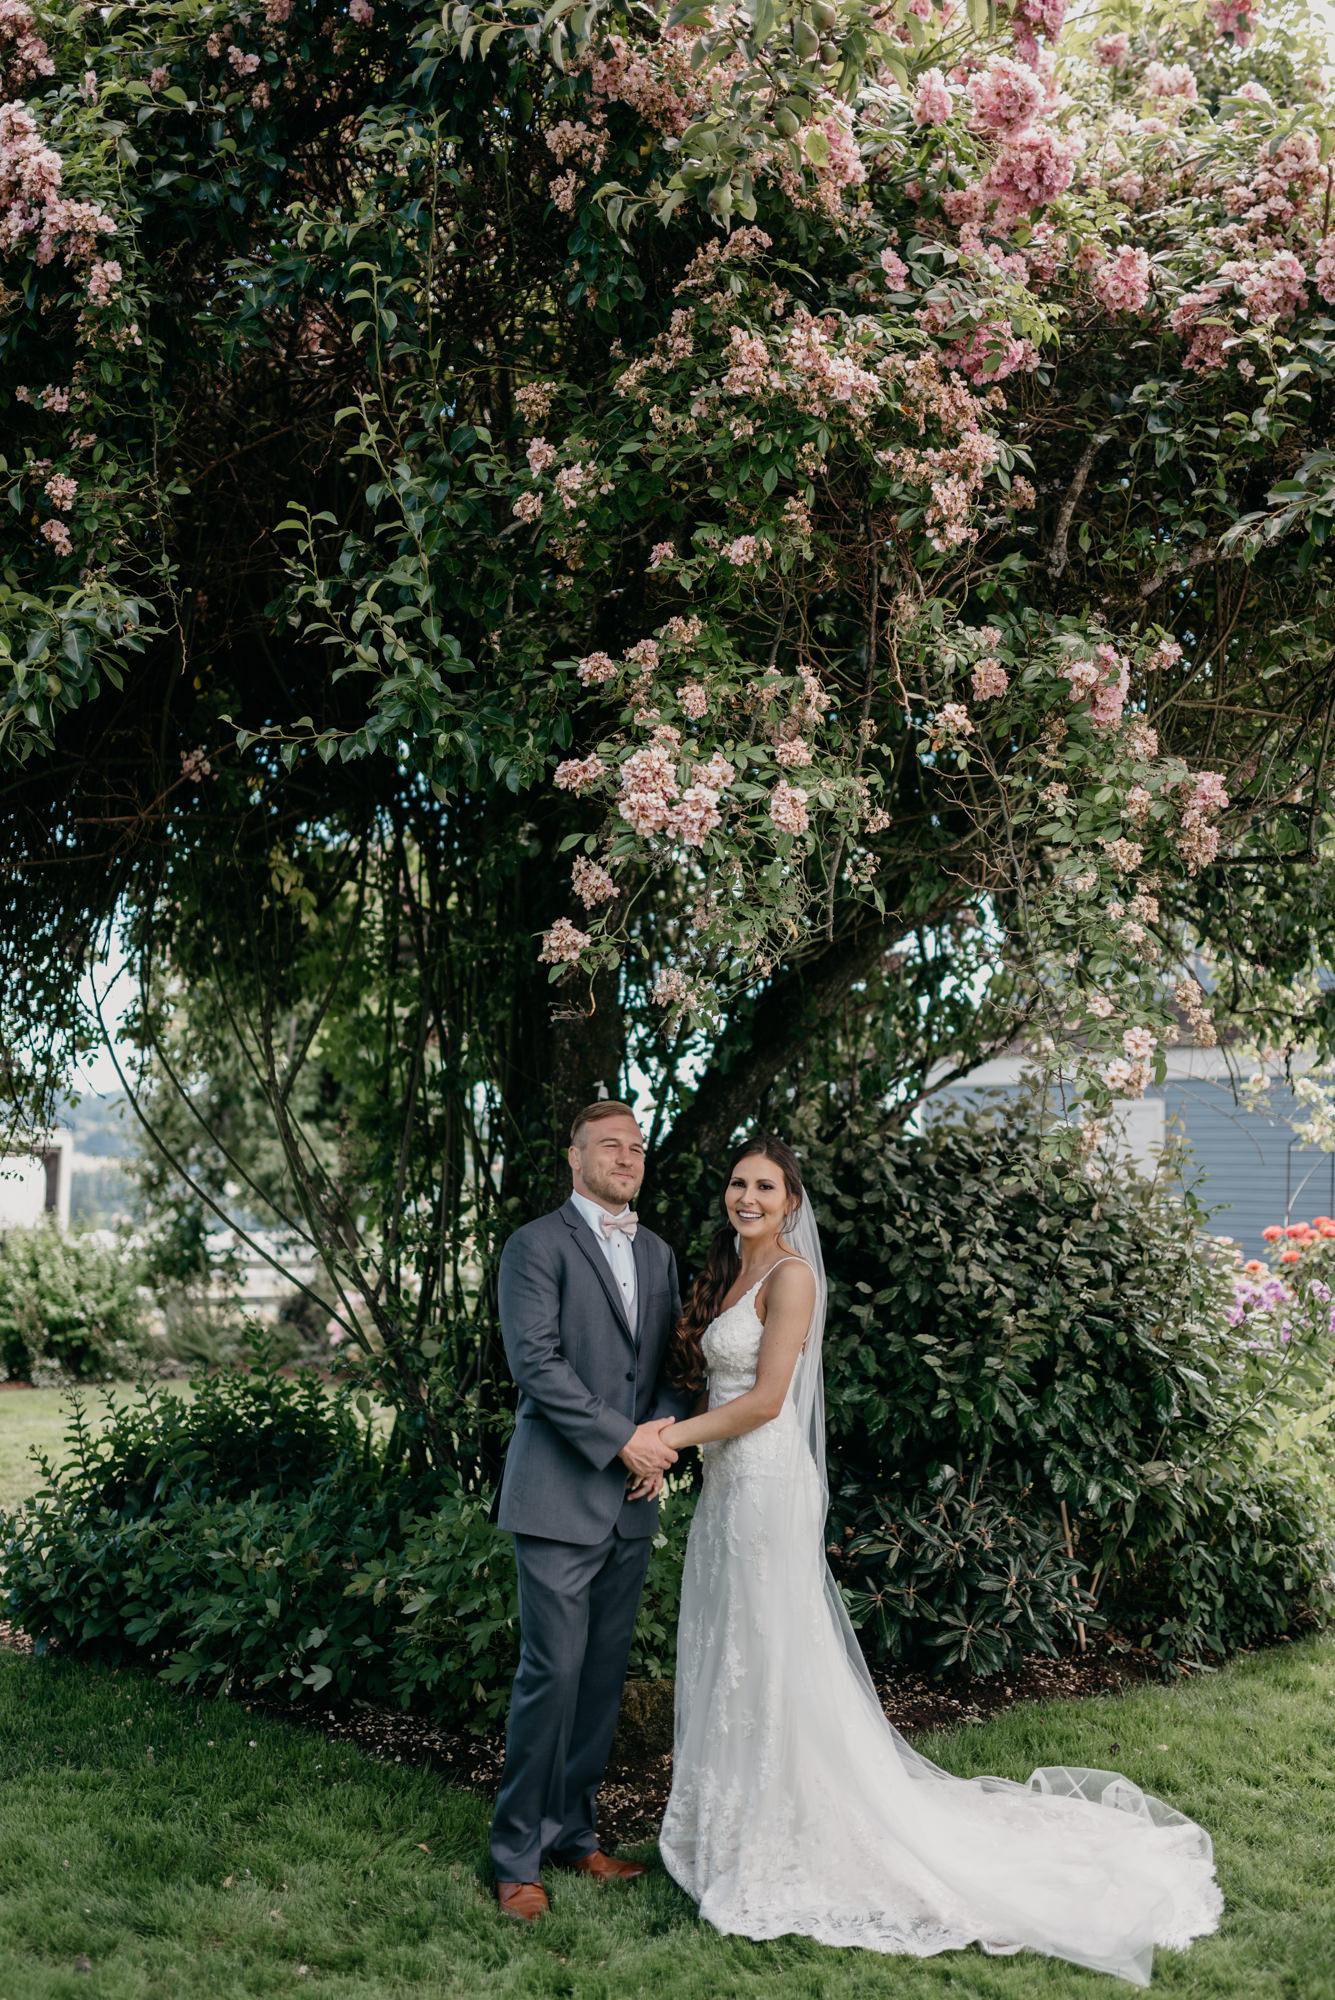 36-lake-oswego-wedding-portland-couple-rose-tree.jpg